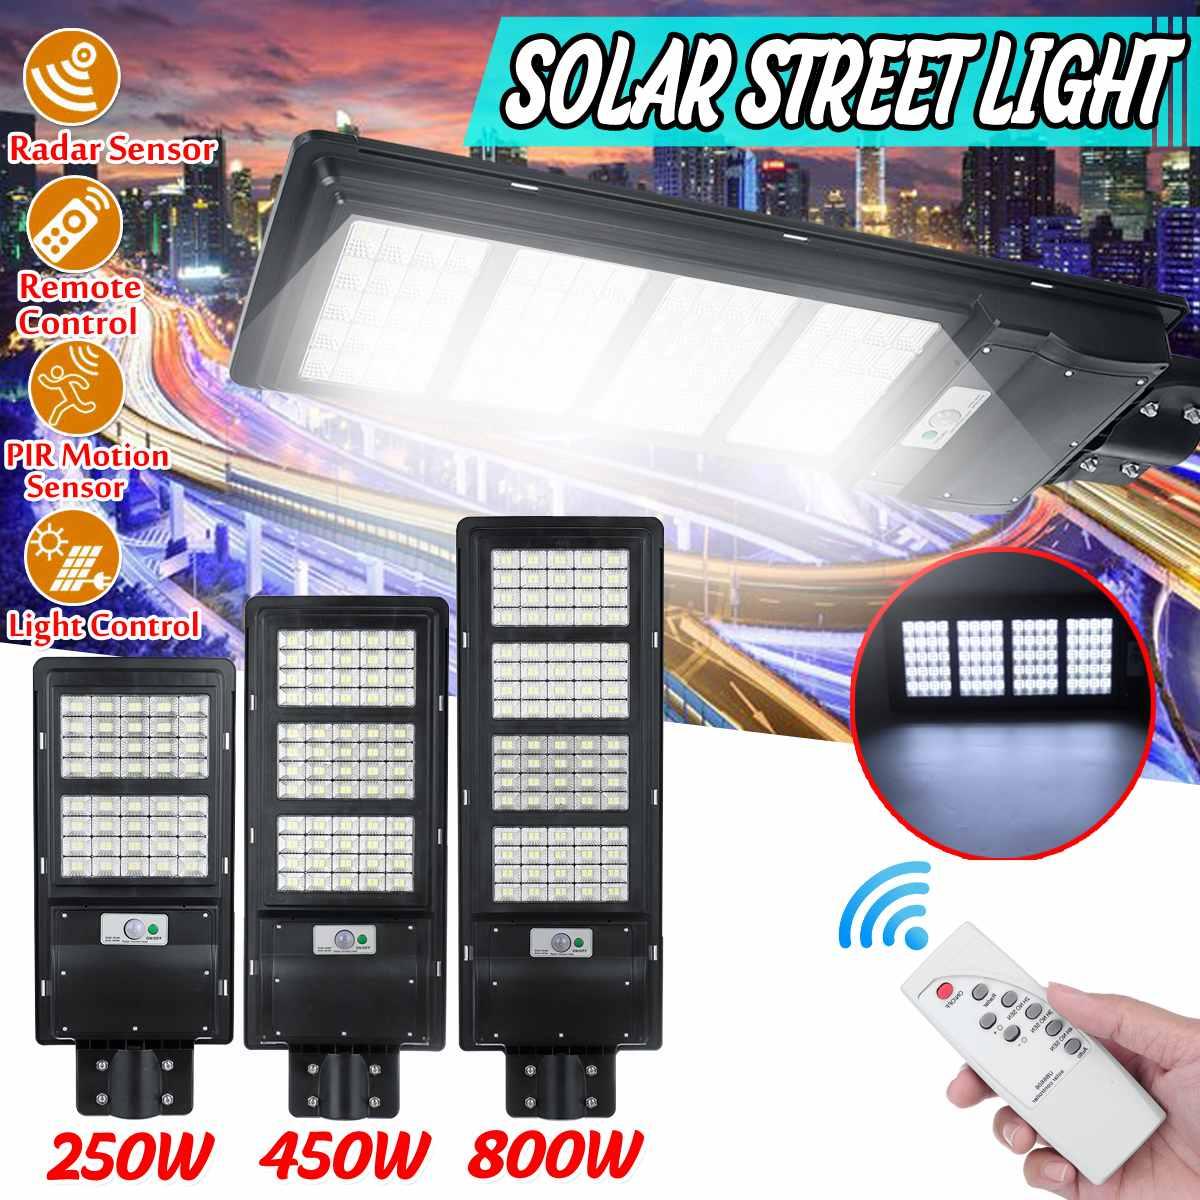 Polycrystalline Solar Led Street Light Tahan Air Ip65 Peta Lampu Taman Lampu Outdoor Radar Motion Sensor Light Led Dengan Rc Lampu Jalan Aliexpress